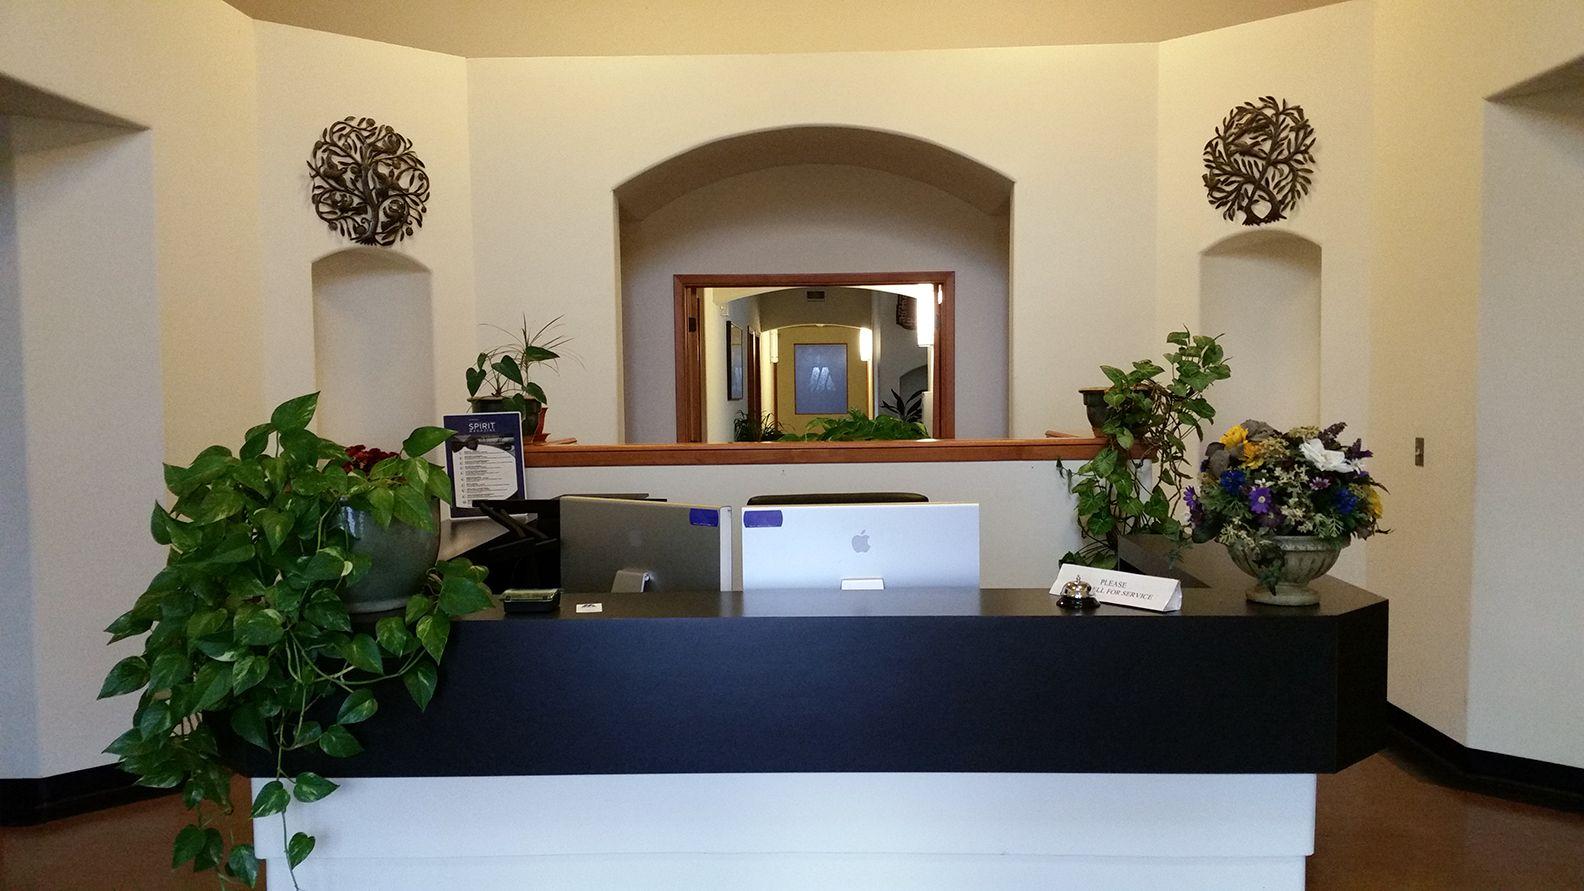 Reception area of Xynergy's Albuquerque office